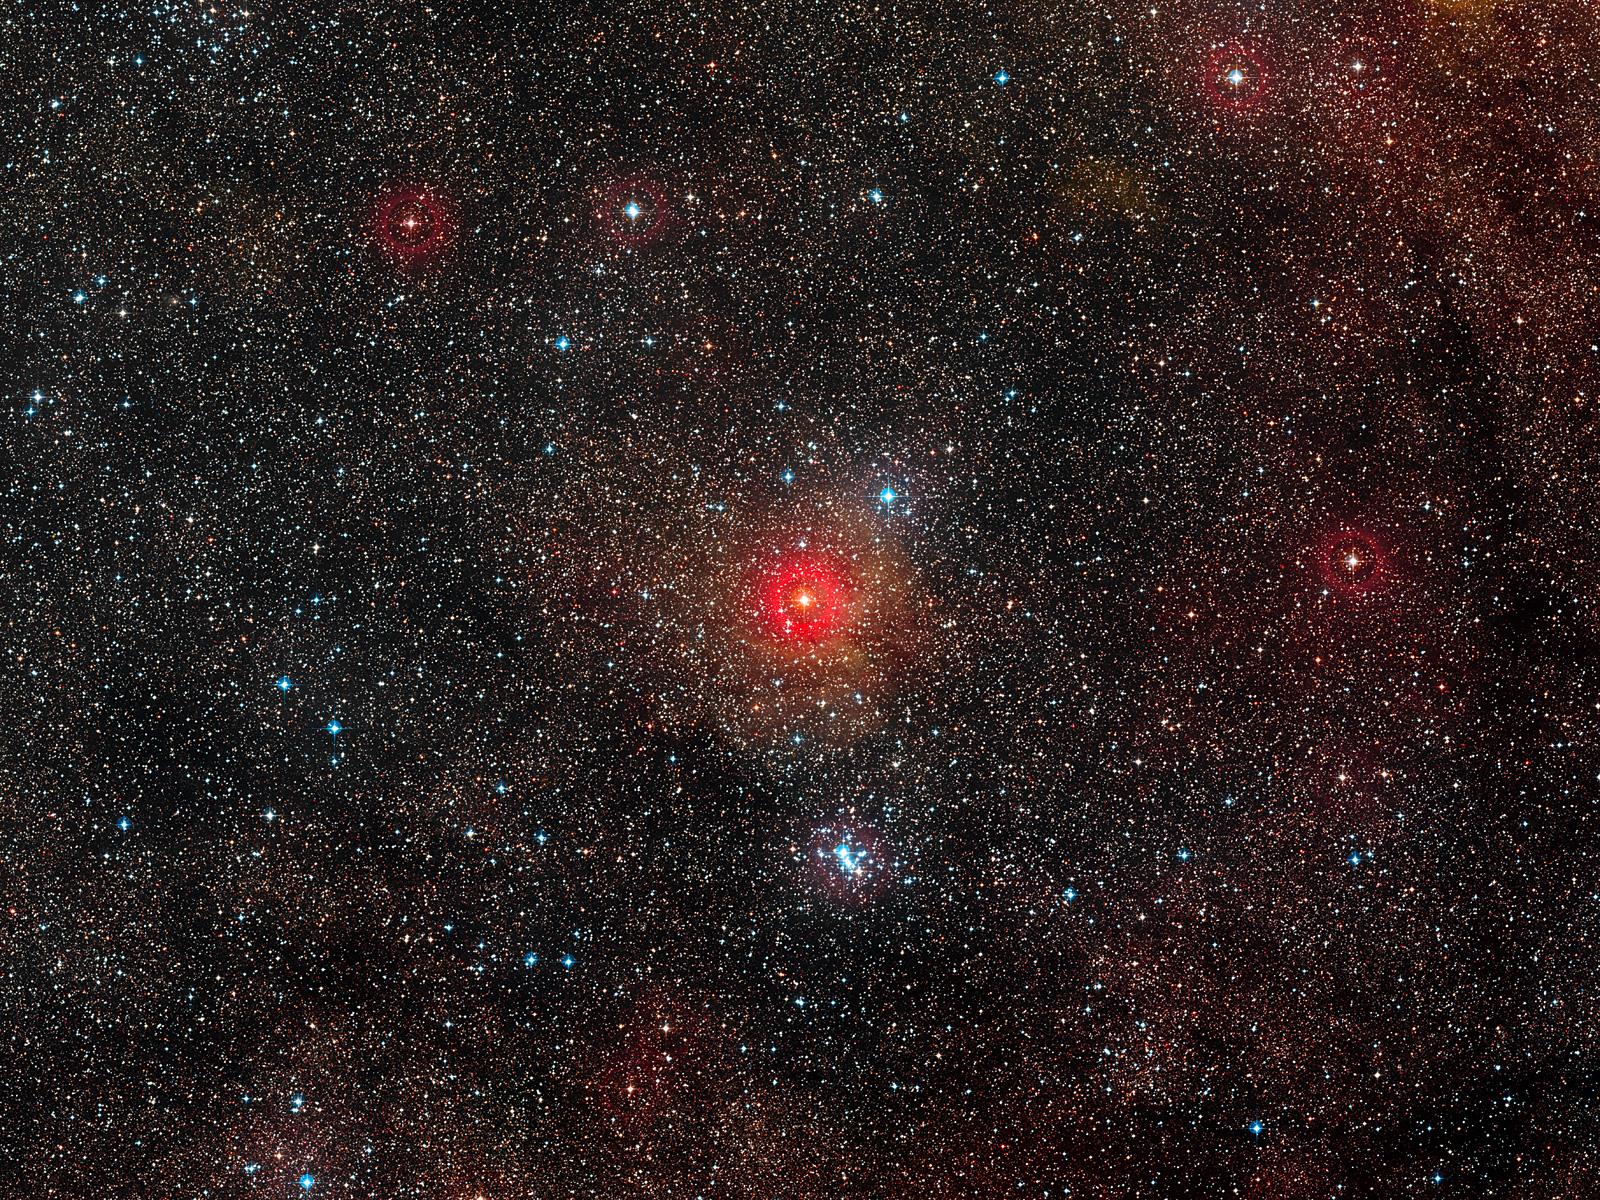 Rare Double Star | Space Wallpaper